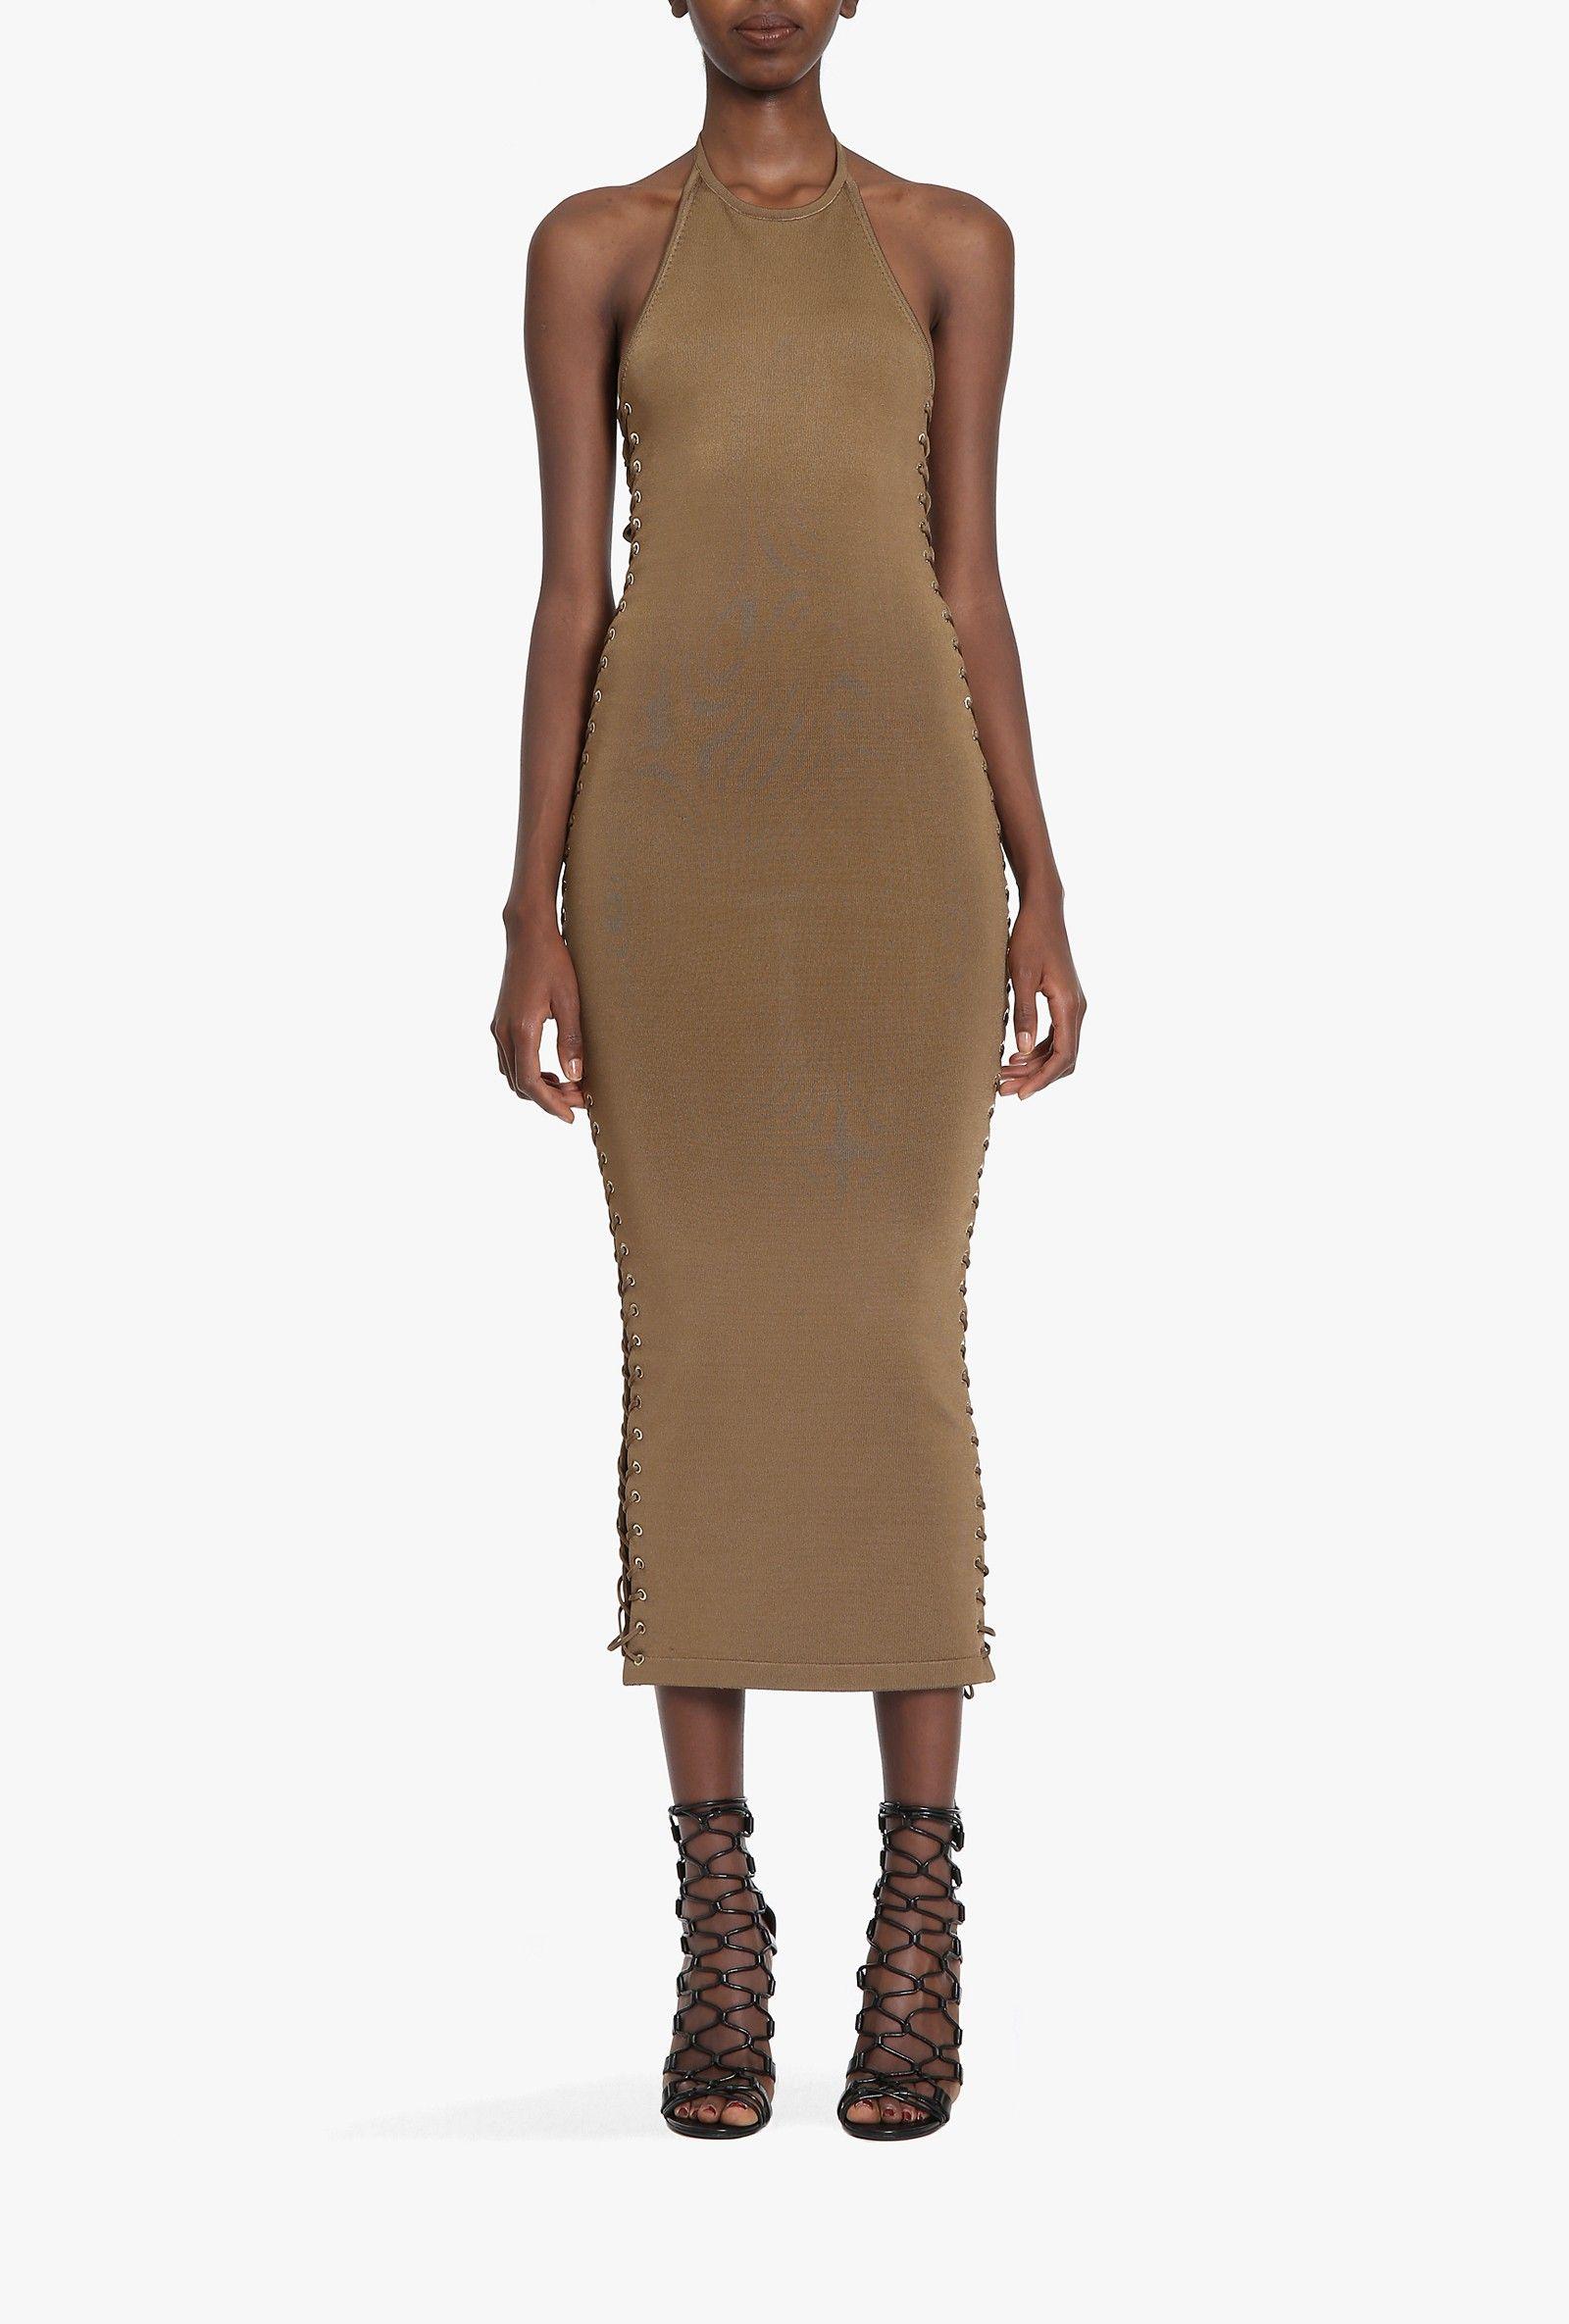 Lace-up stretch viscose knit maxi dress | Women's knit dresses | Balmain